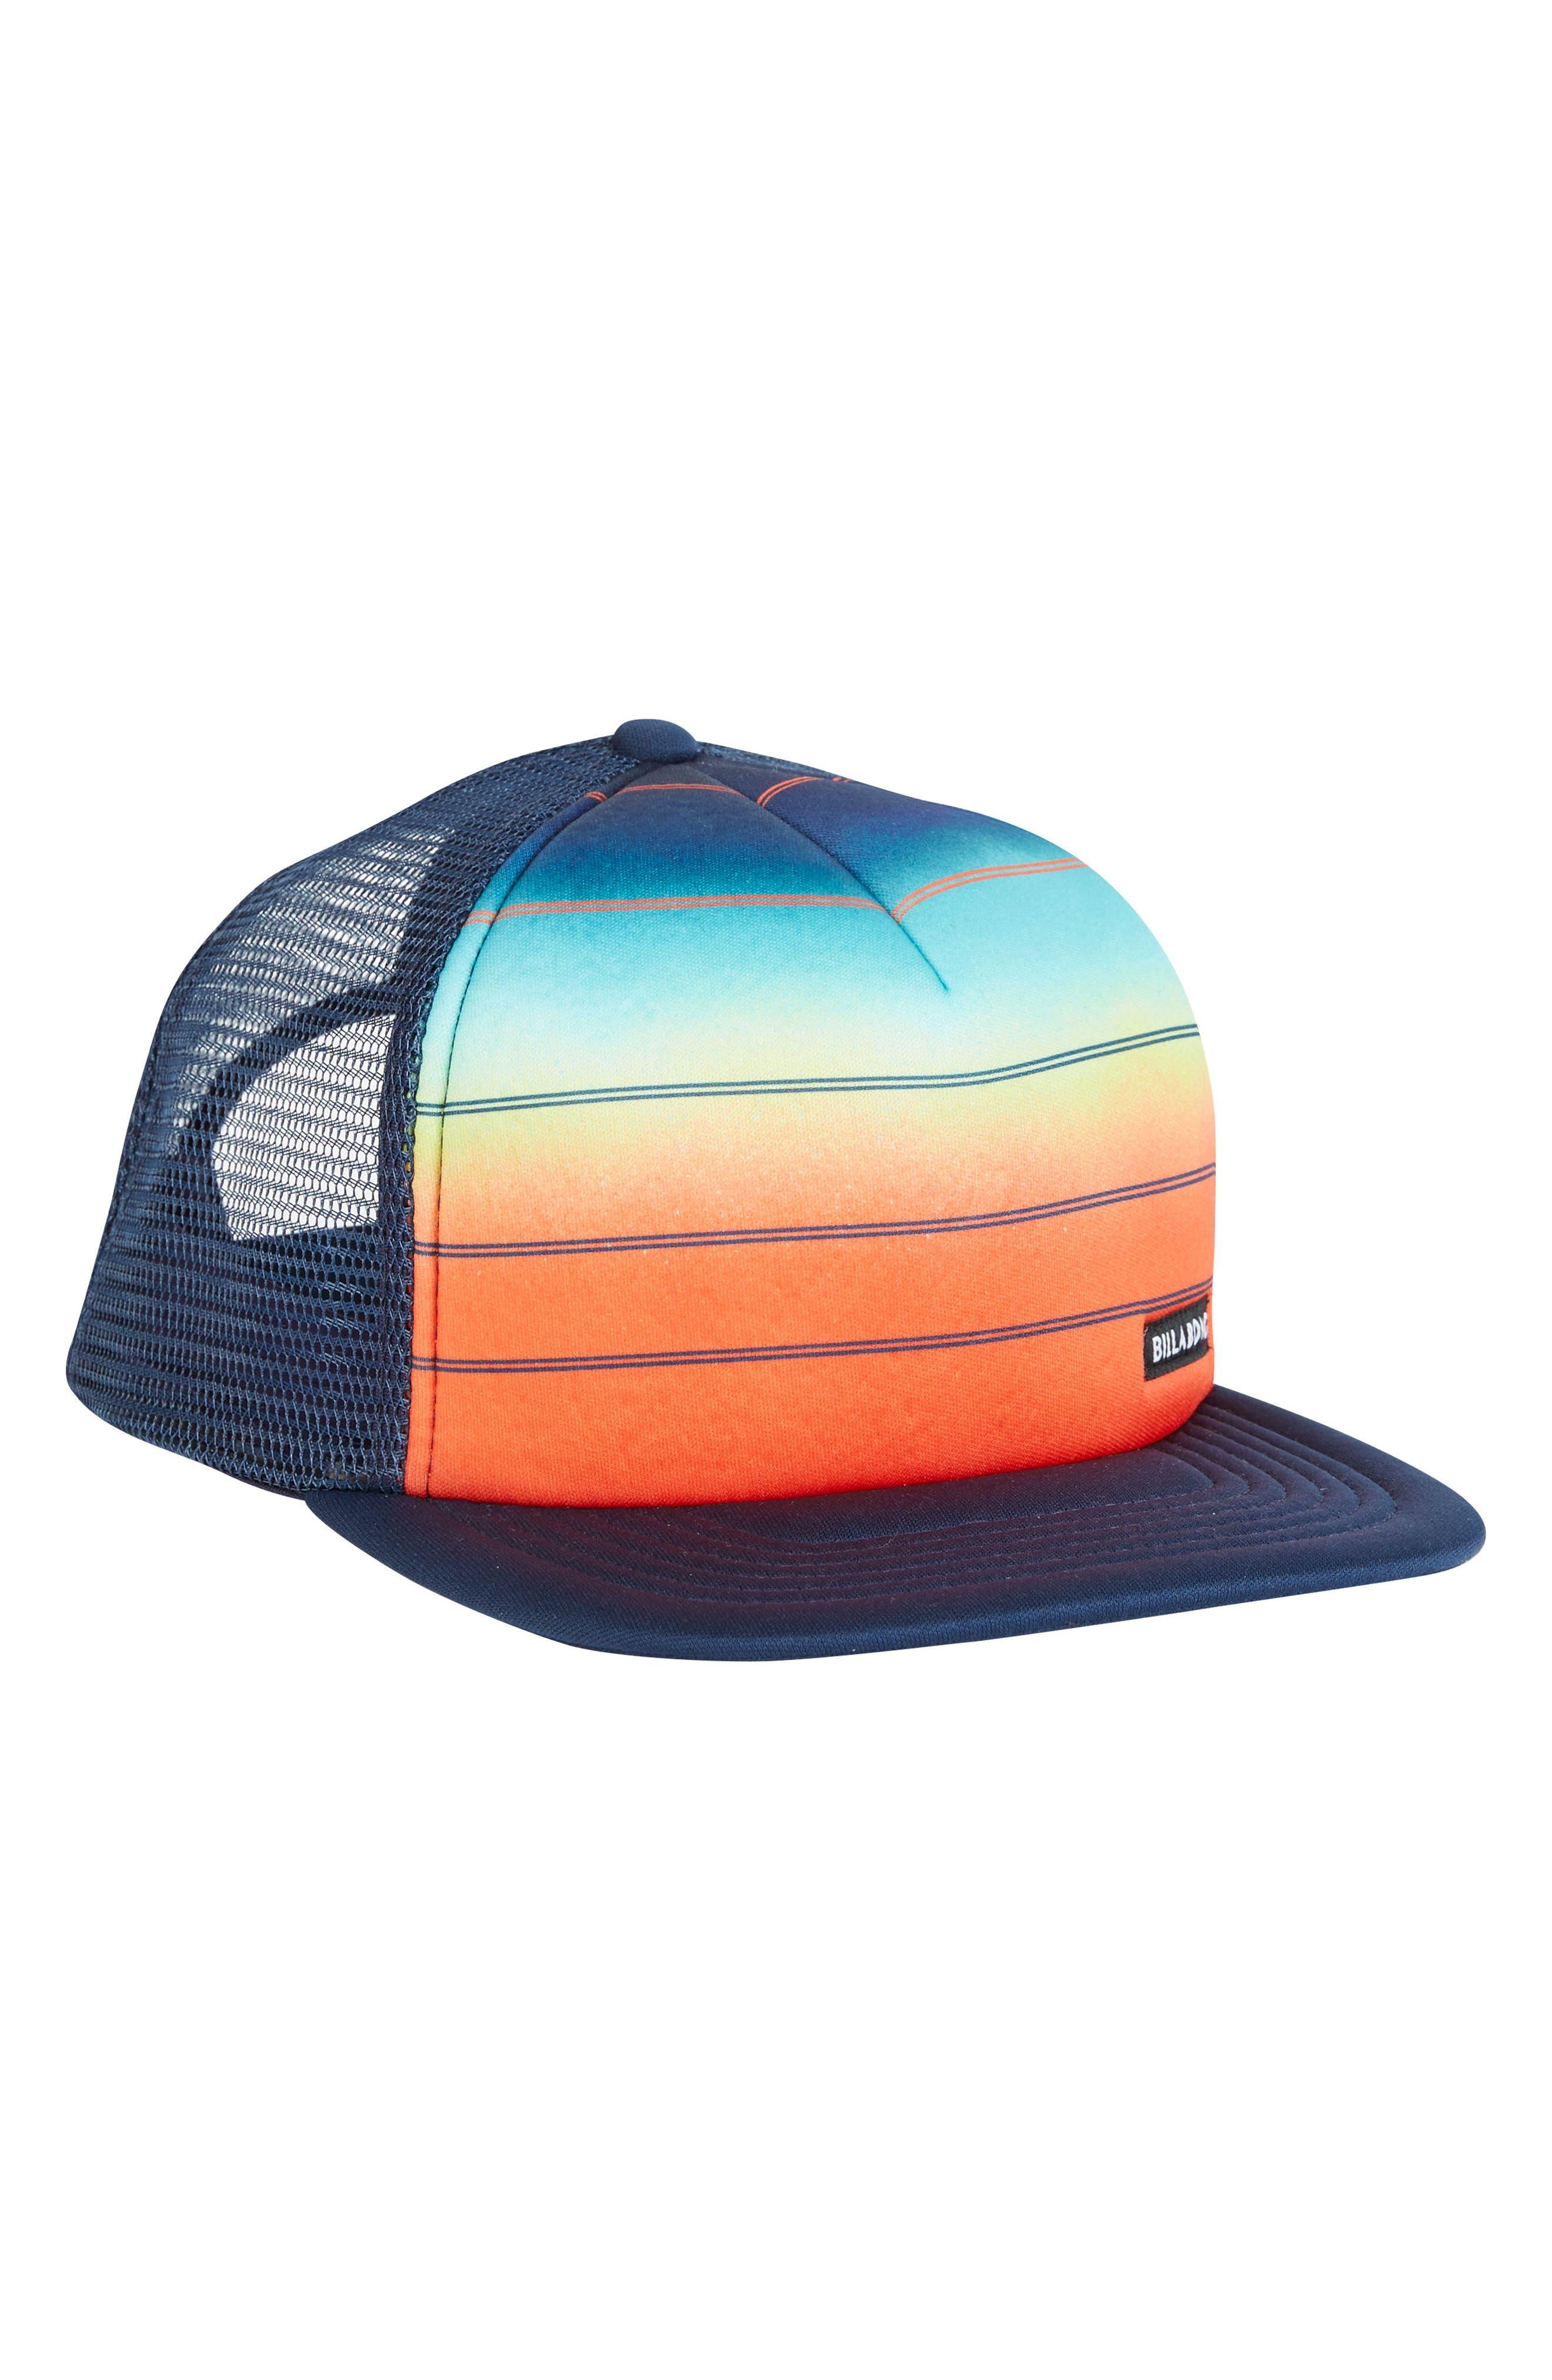 73 Snapback Trucker Hat,                             Alternate thumbnail 4, color,                             Orange